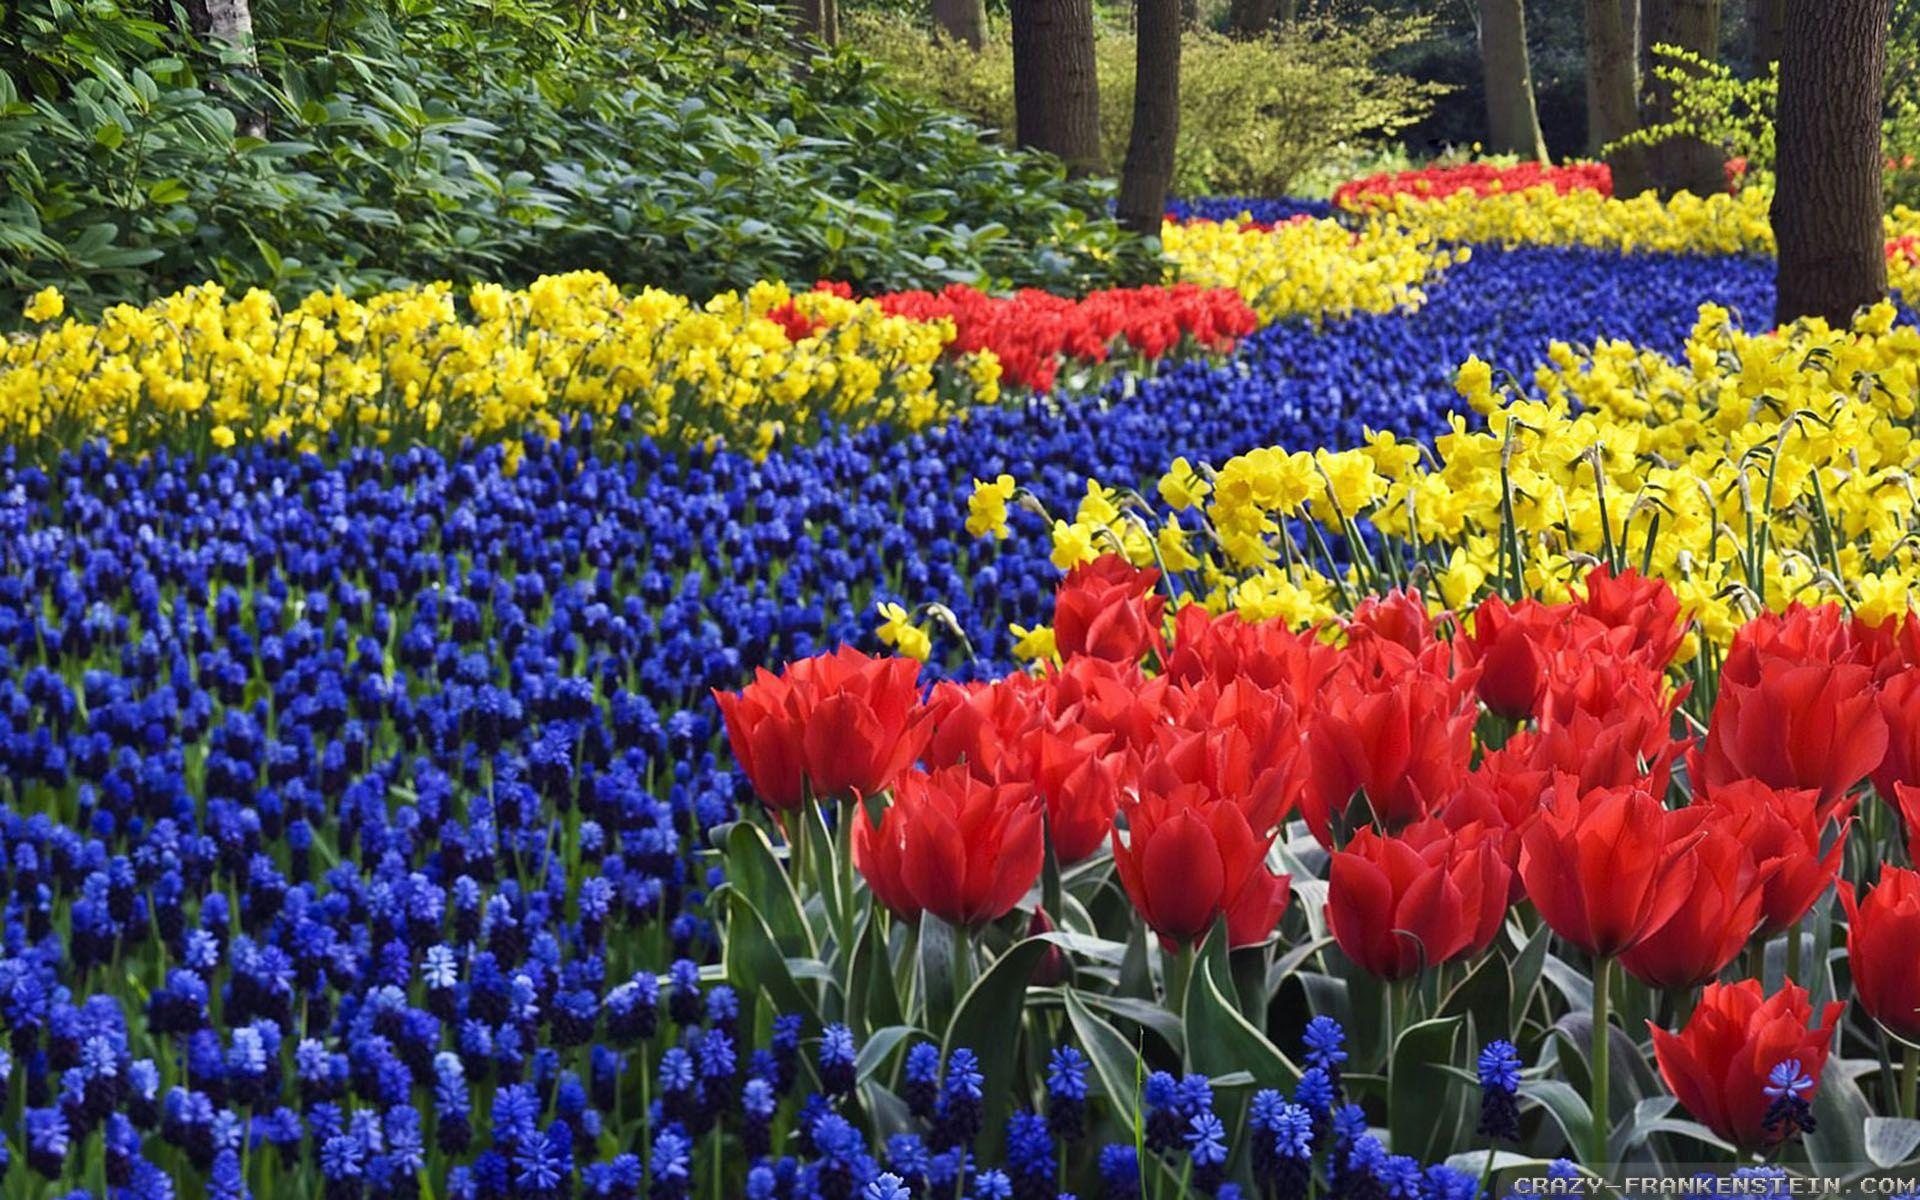 YouWall Spring Flowers Wallpaper wallpaperwallpapersfree